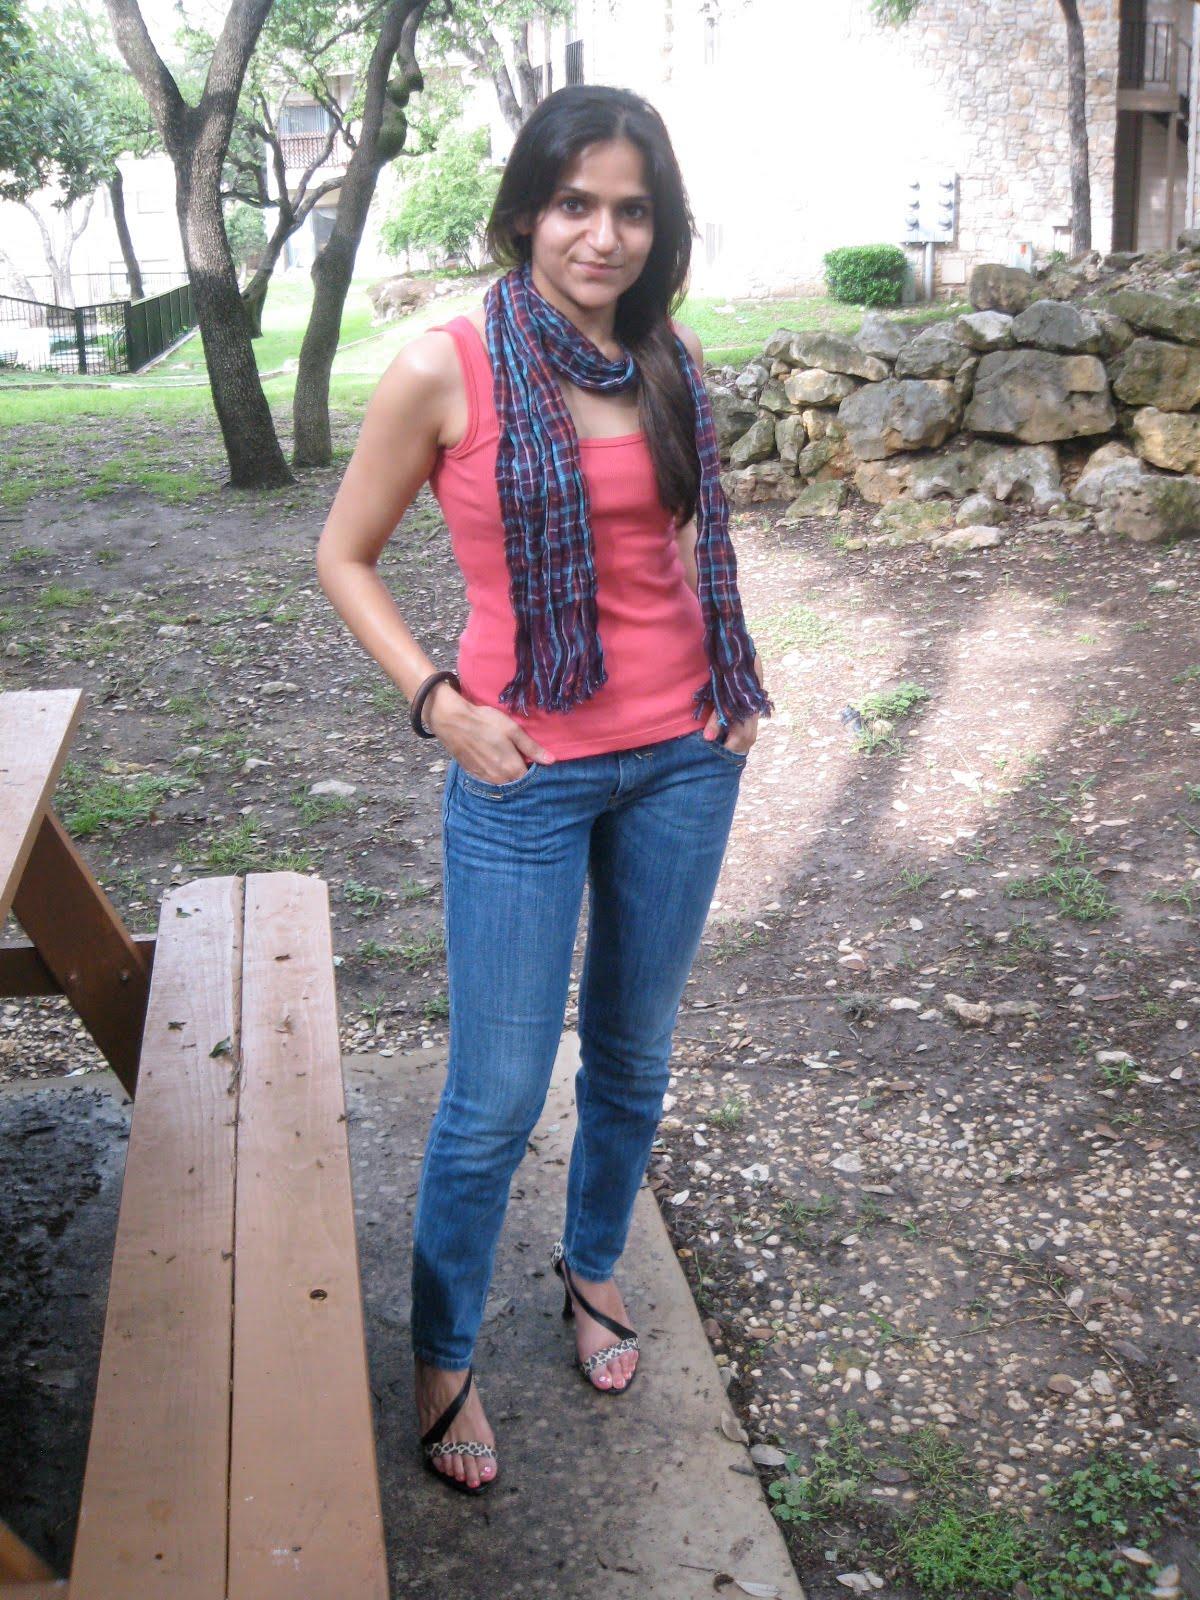 Tank - CK [06']; Jeans - Miss Sixty [09']